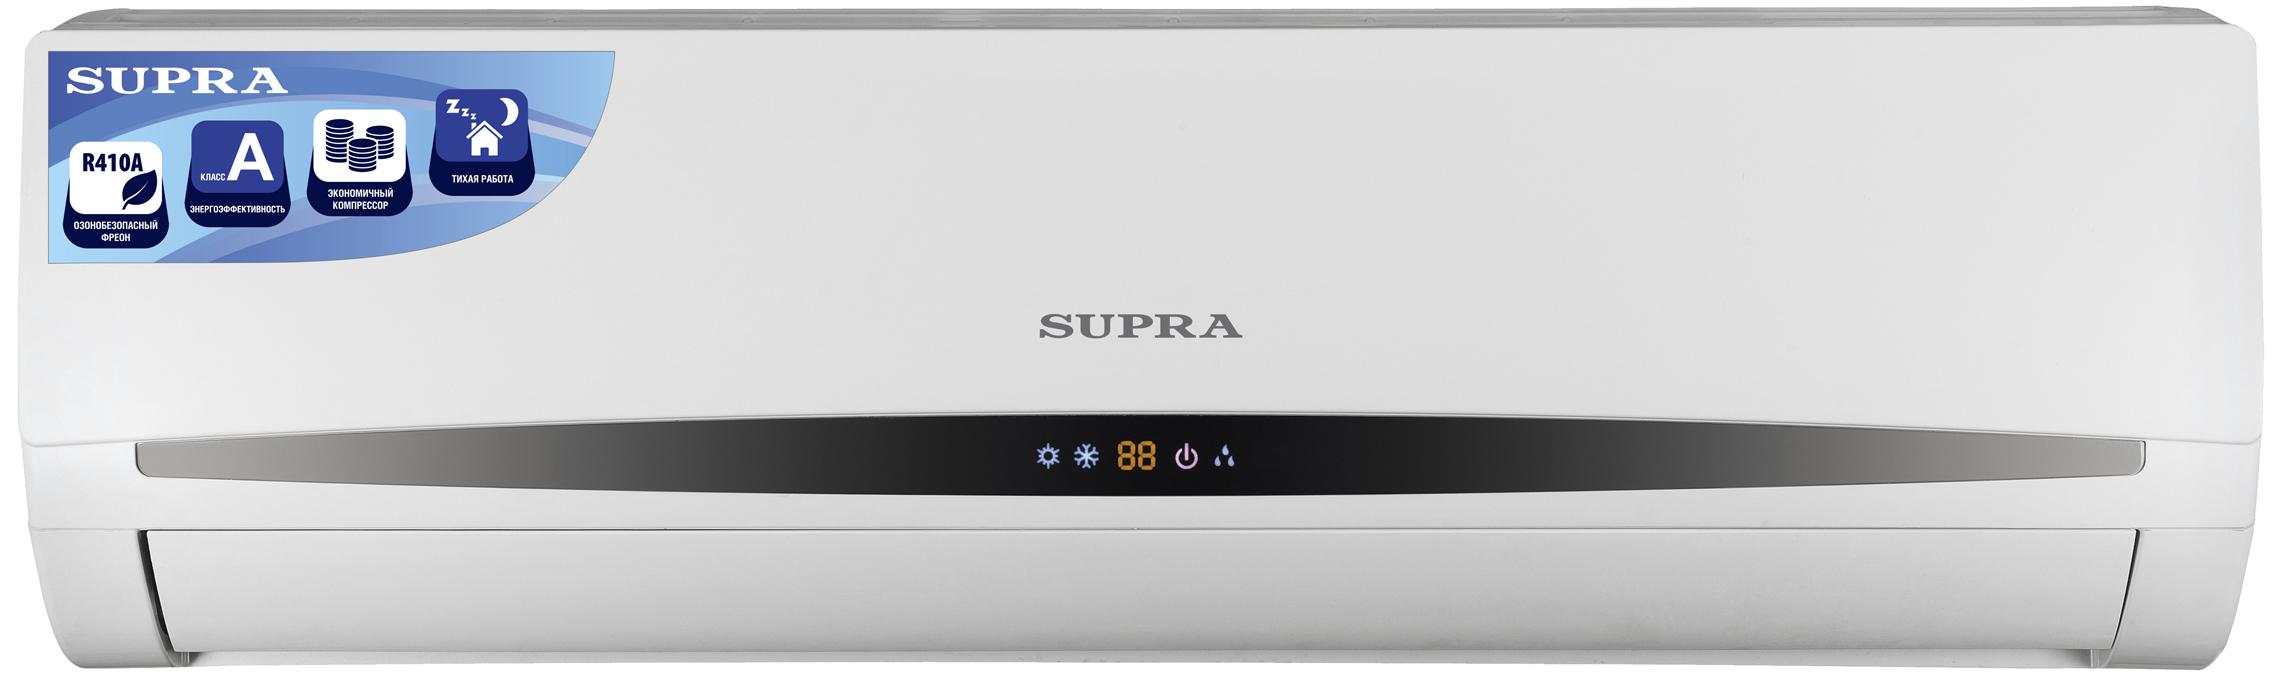 Кондиционер Supra SA07GBE